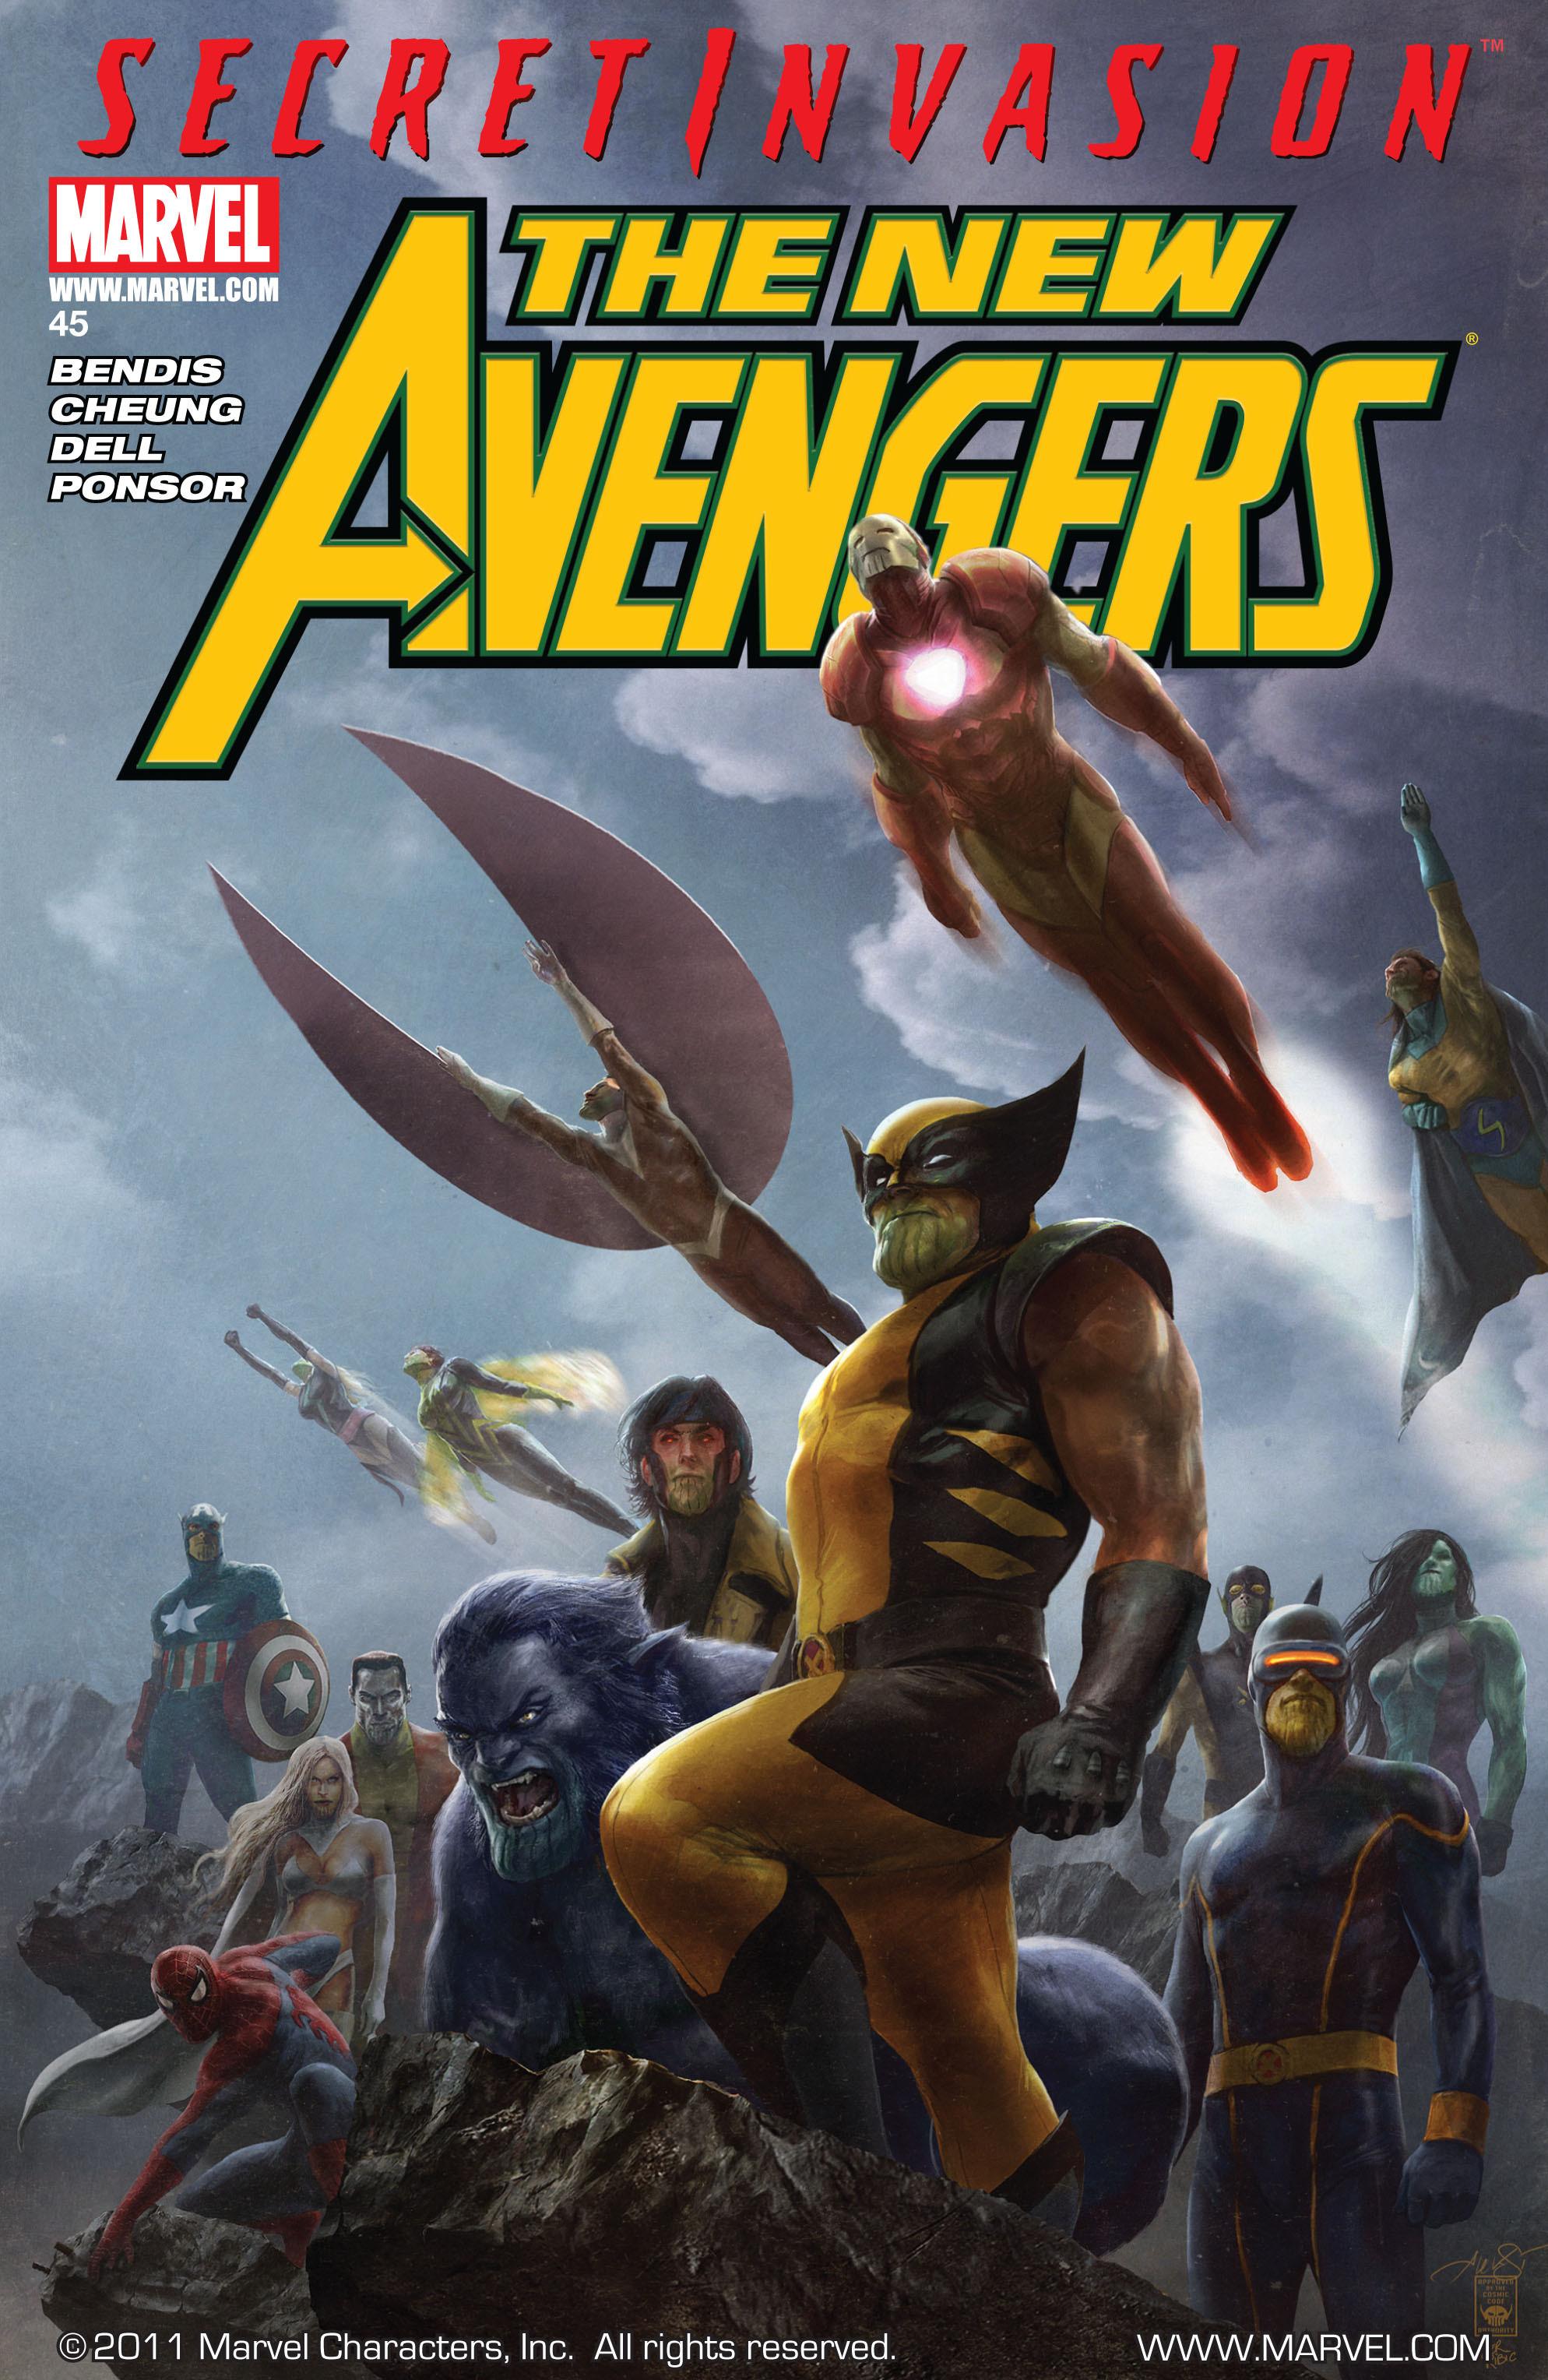 New Avengers Vol 1 45